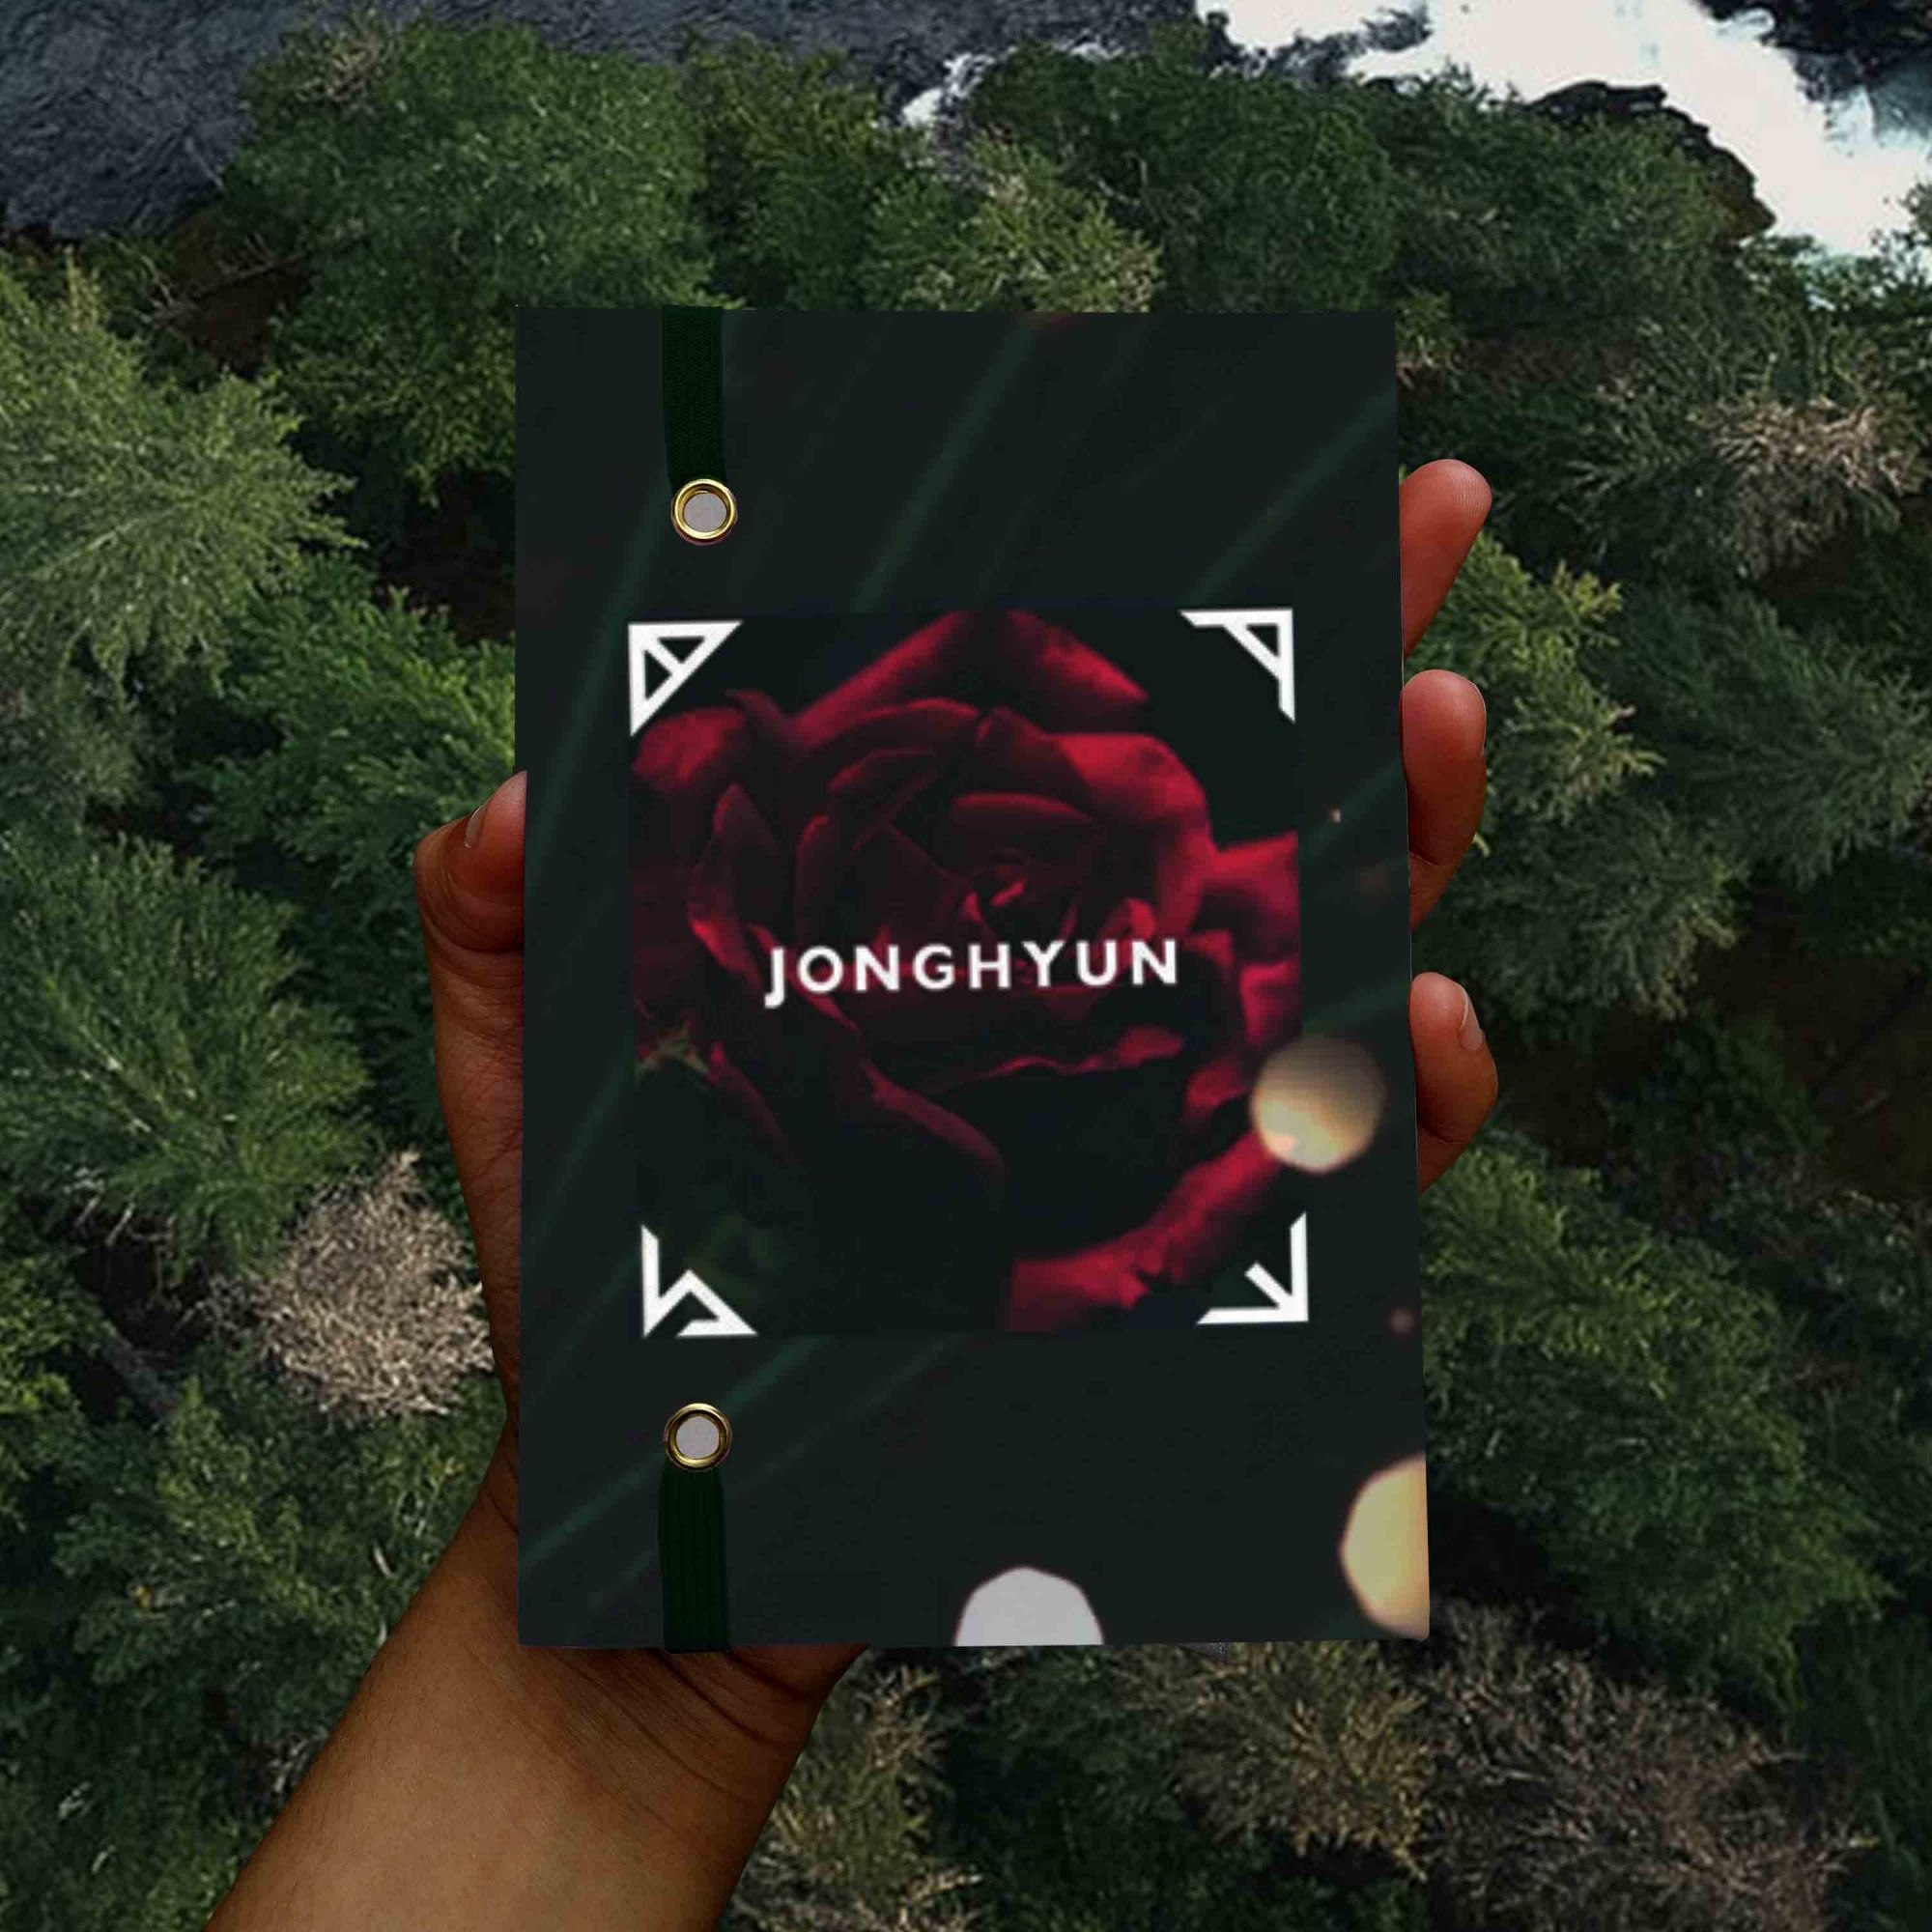 Jonghyun (Shinee) - Deja-Boo  - Lojinha Só Dasoh